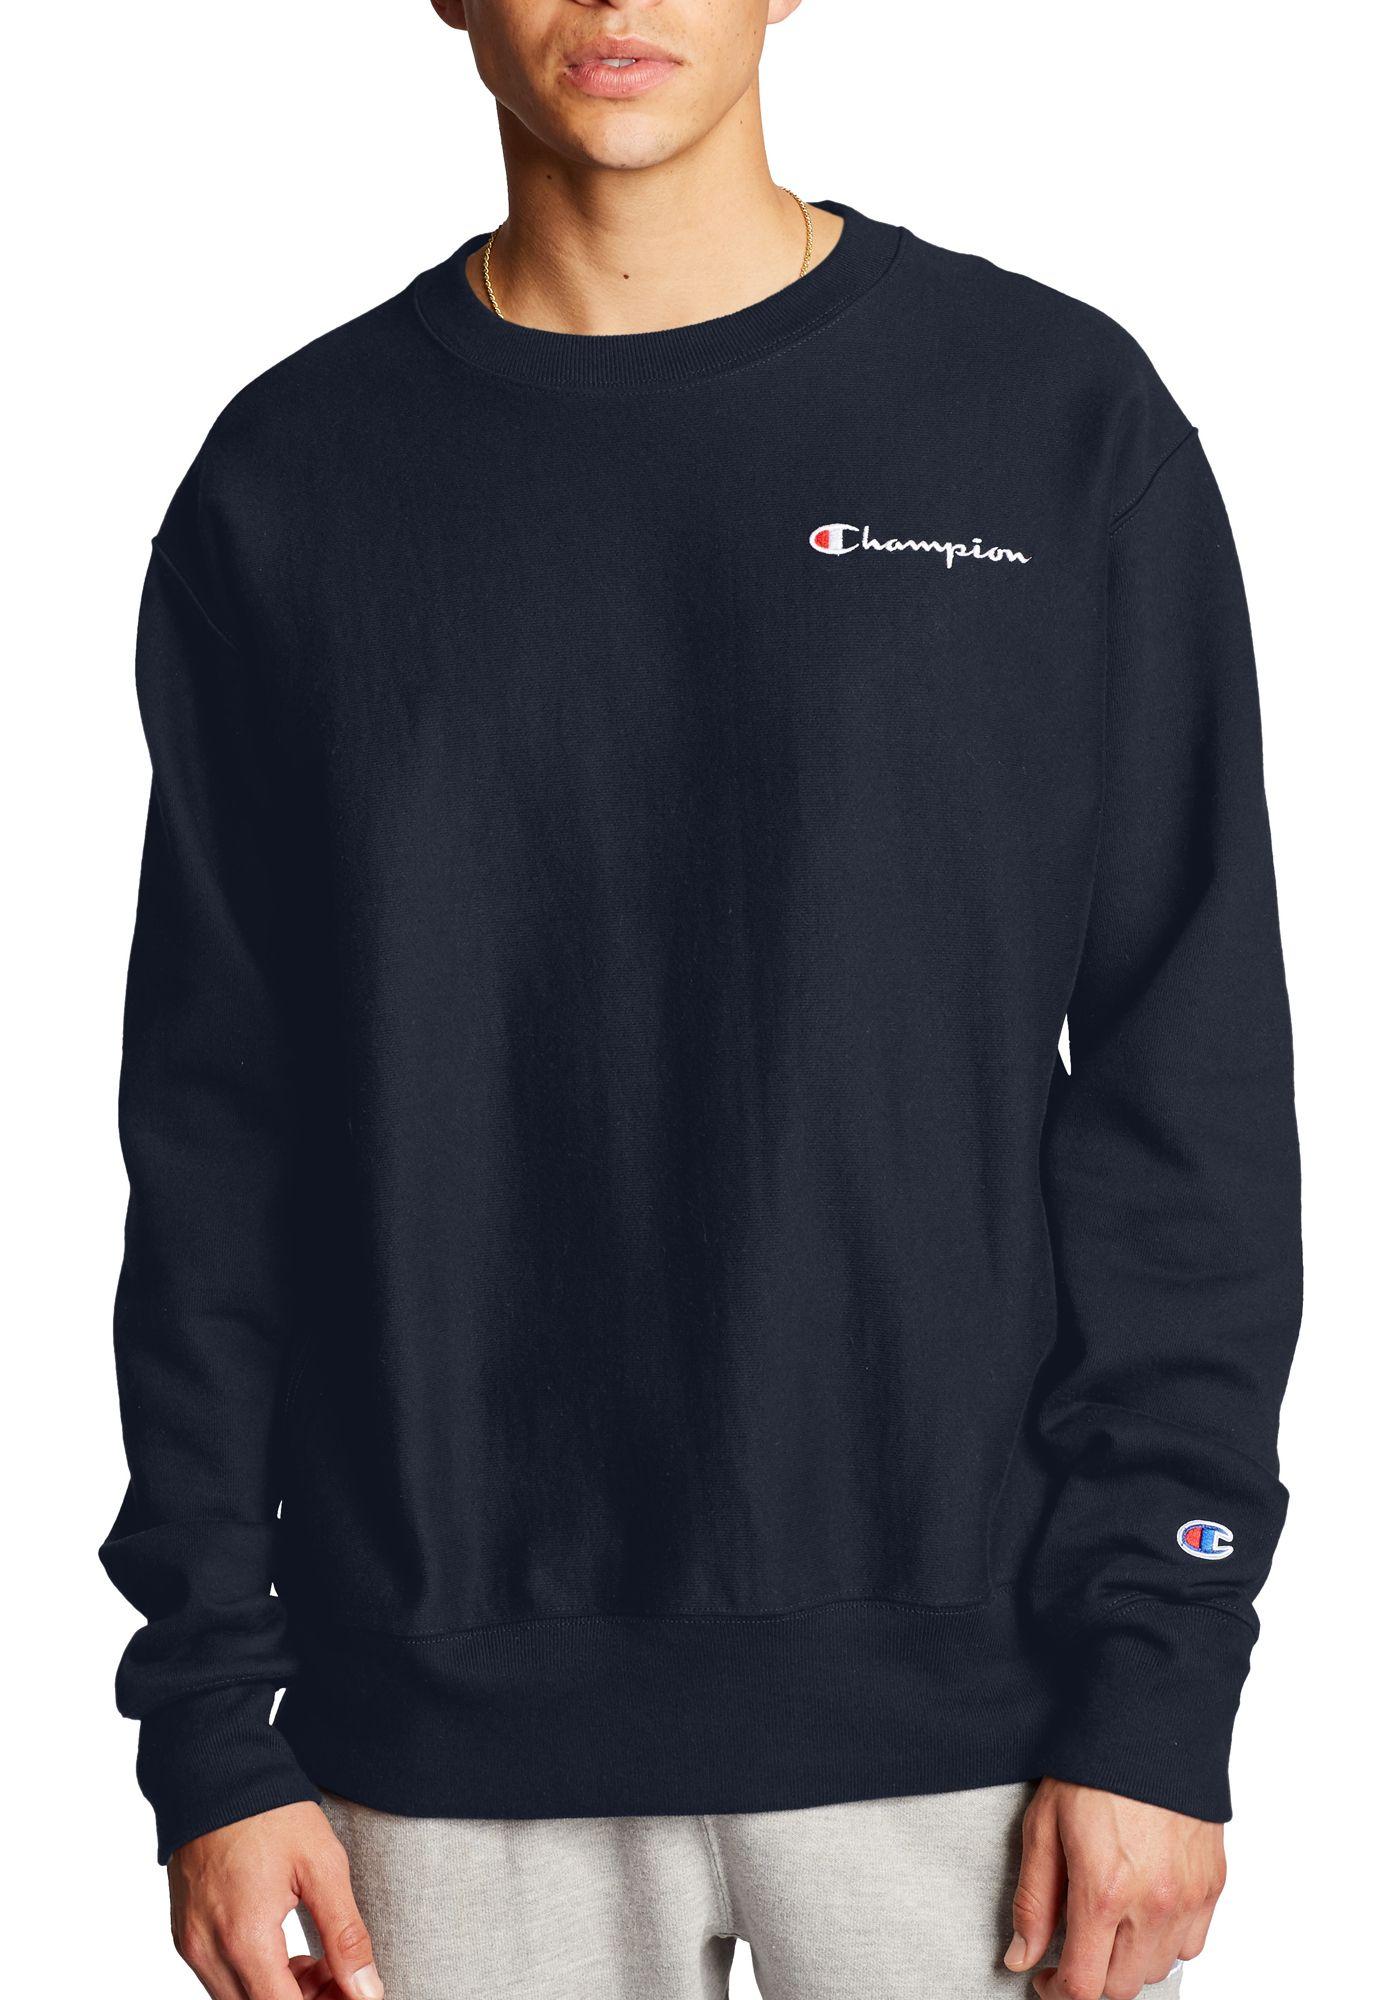 Champion Life Men's Reverse Weave Crewneck Sweatshirt